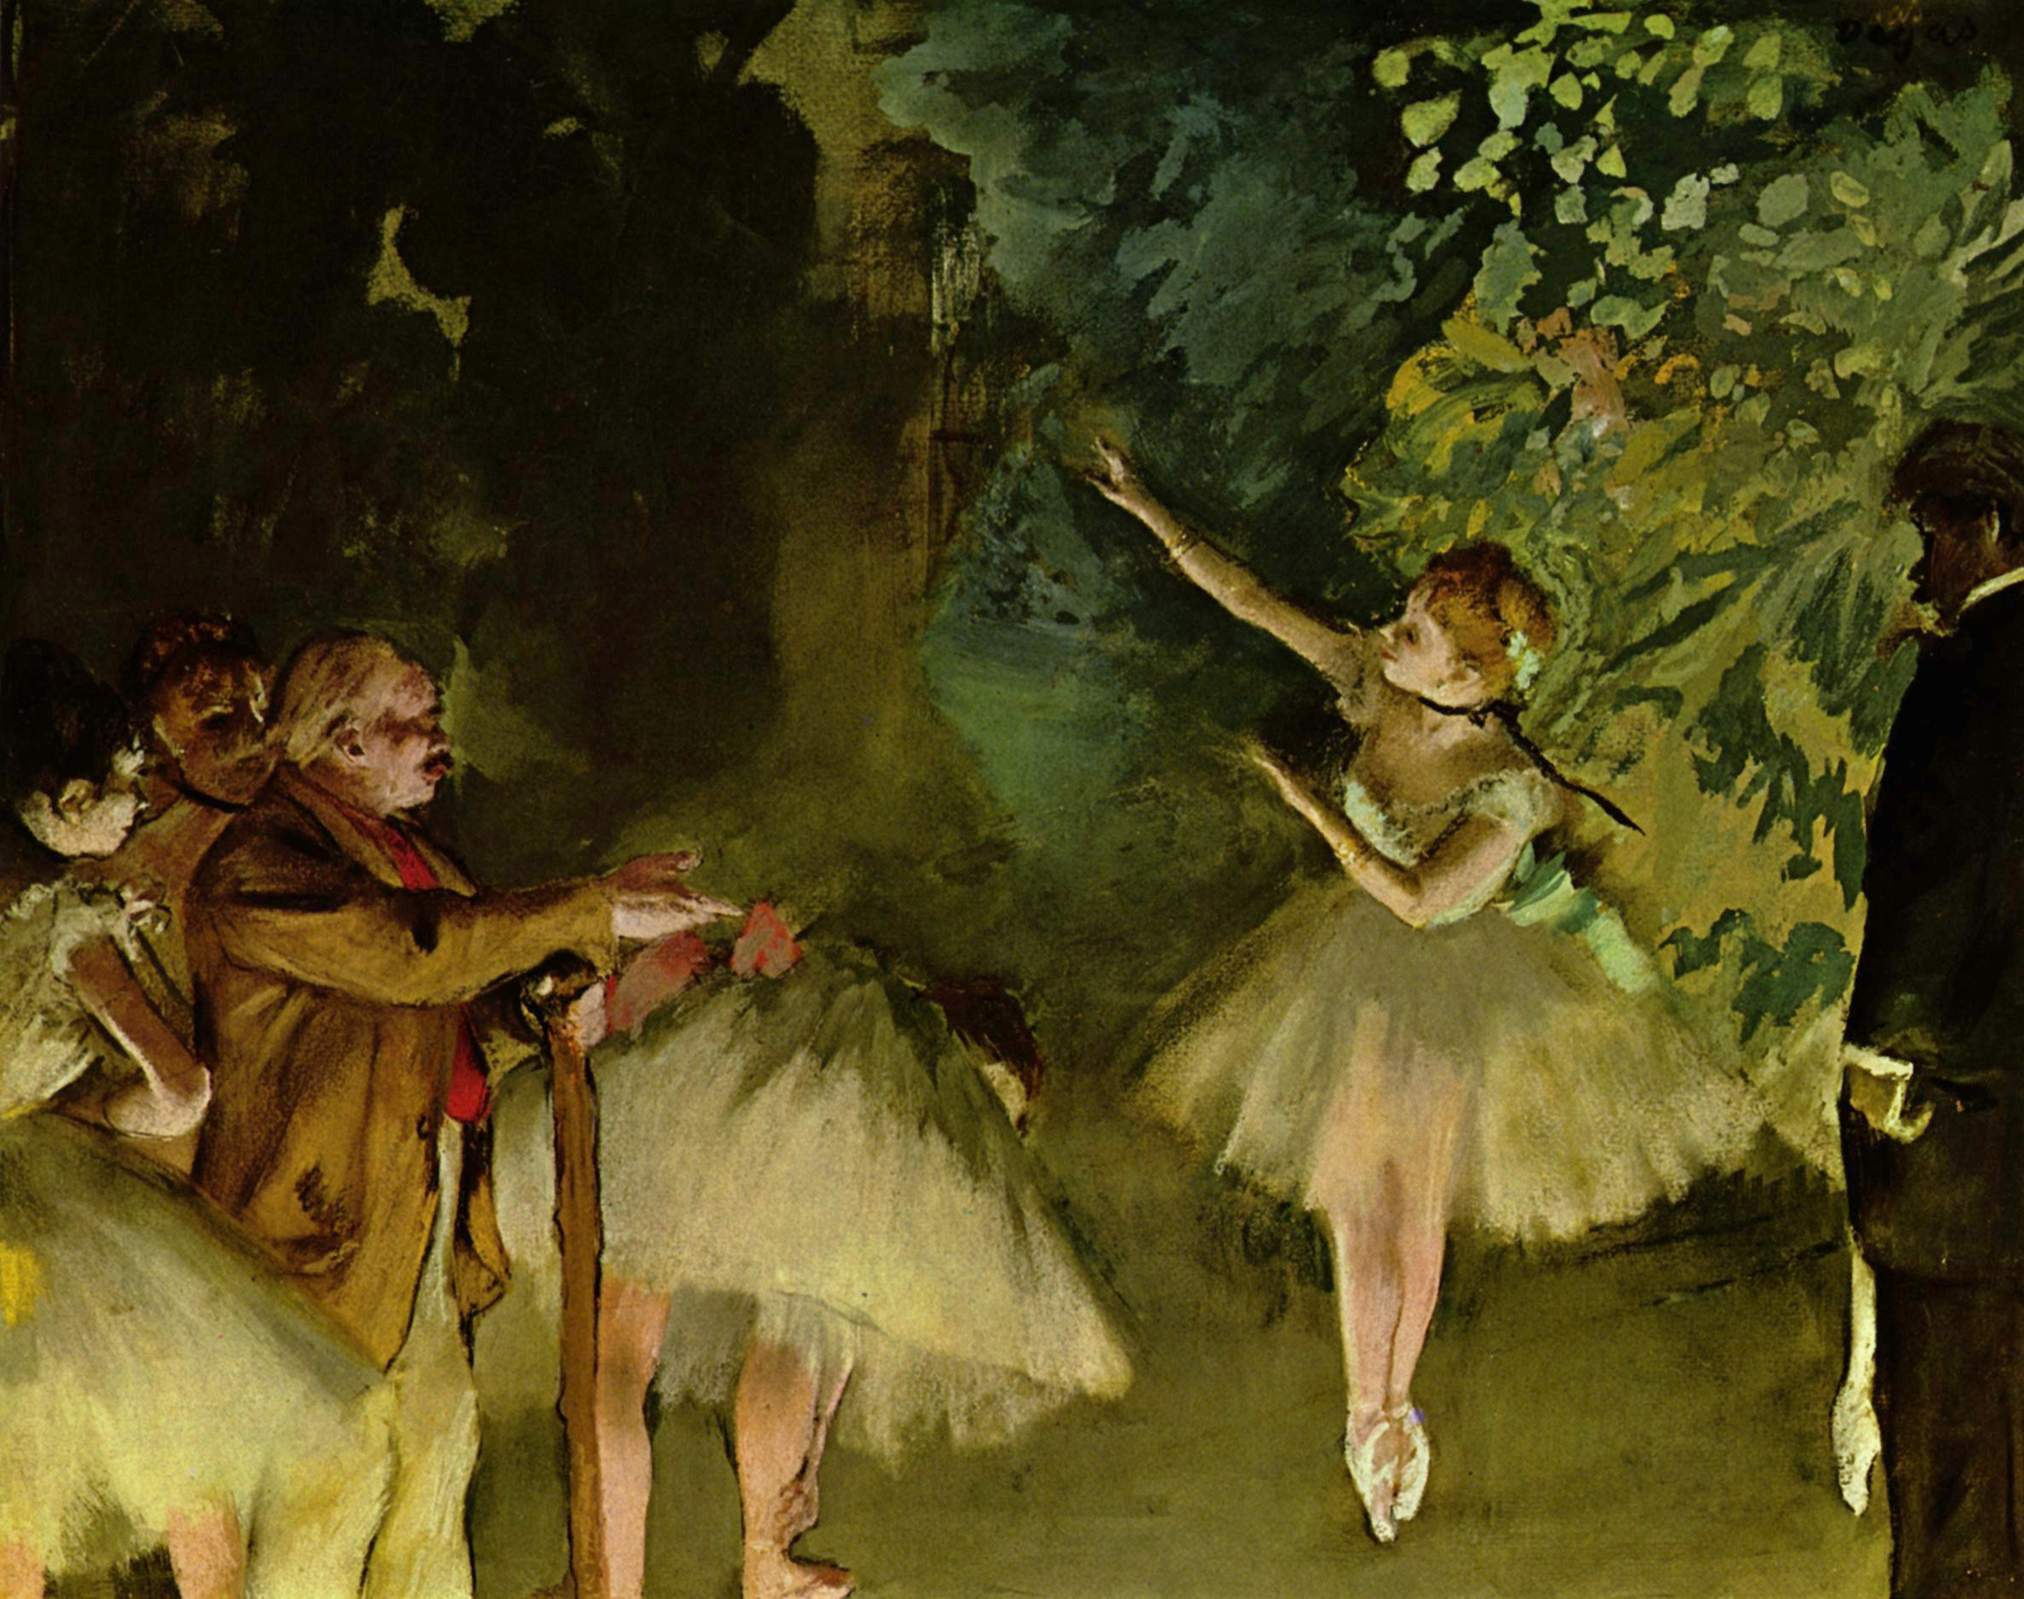 File:Edgar Germain Hilaire Degas 075.jpg - Wikimedia Commons